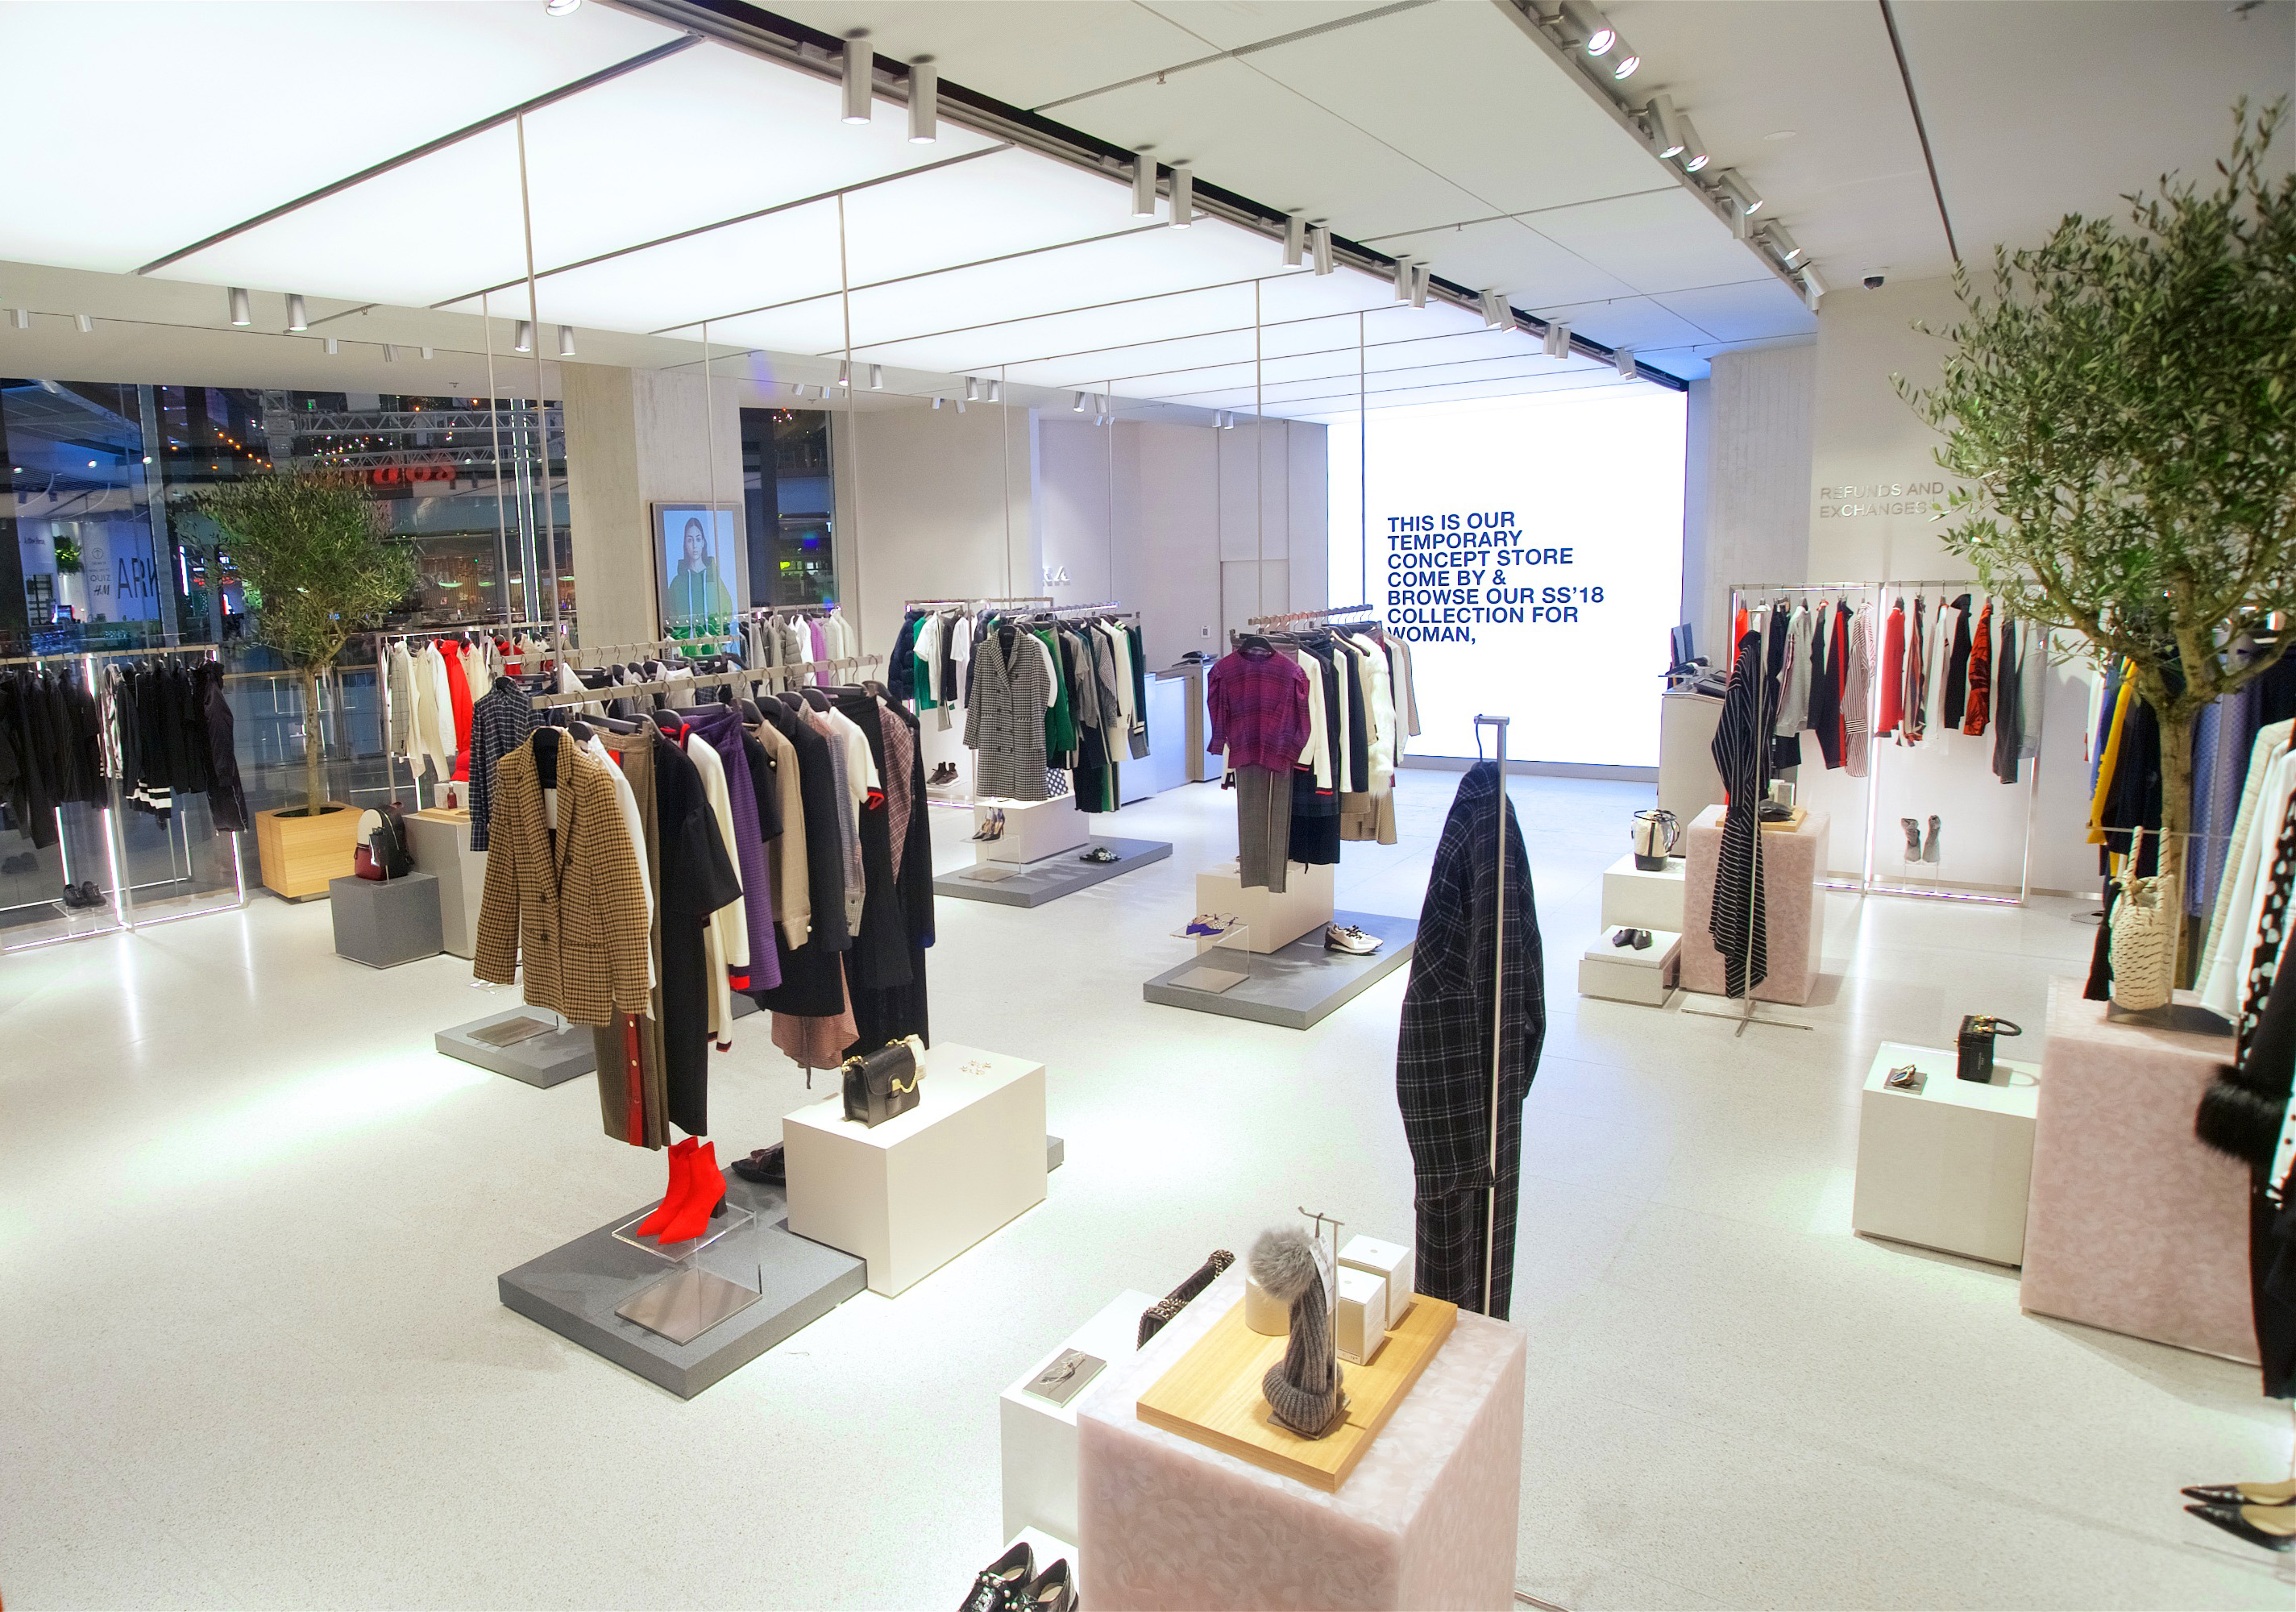 The Zara pop-up store in London